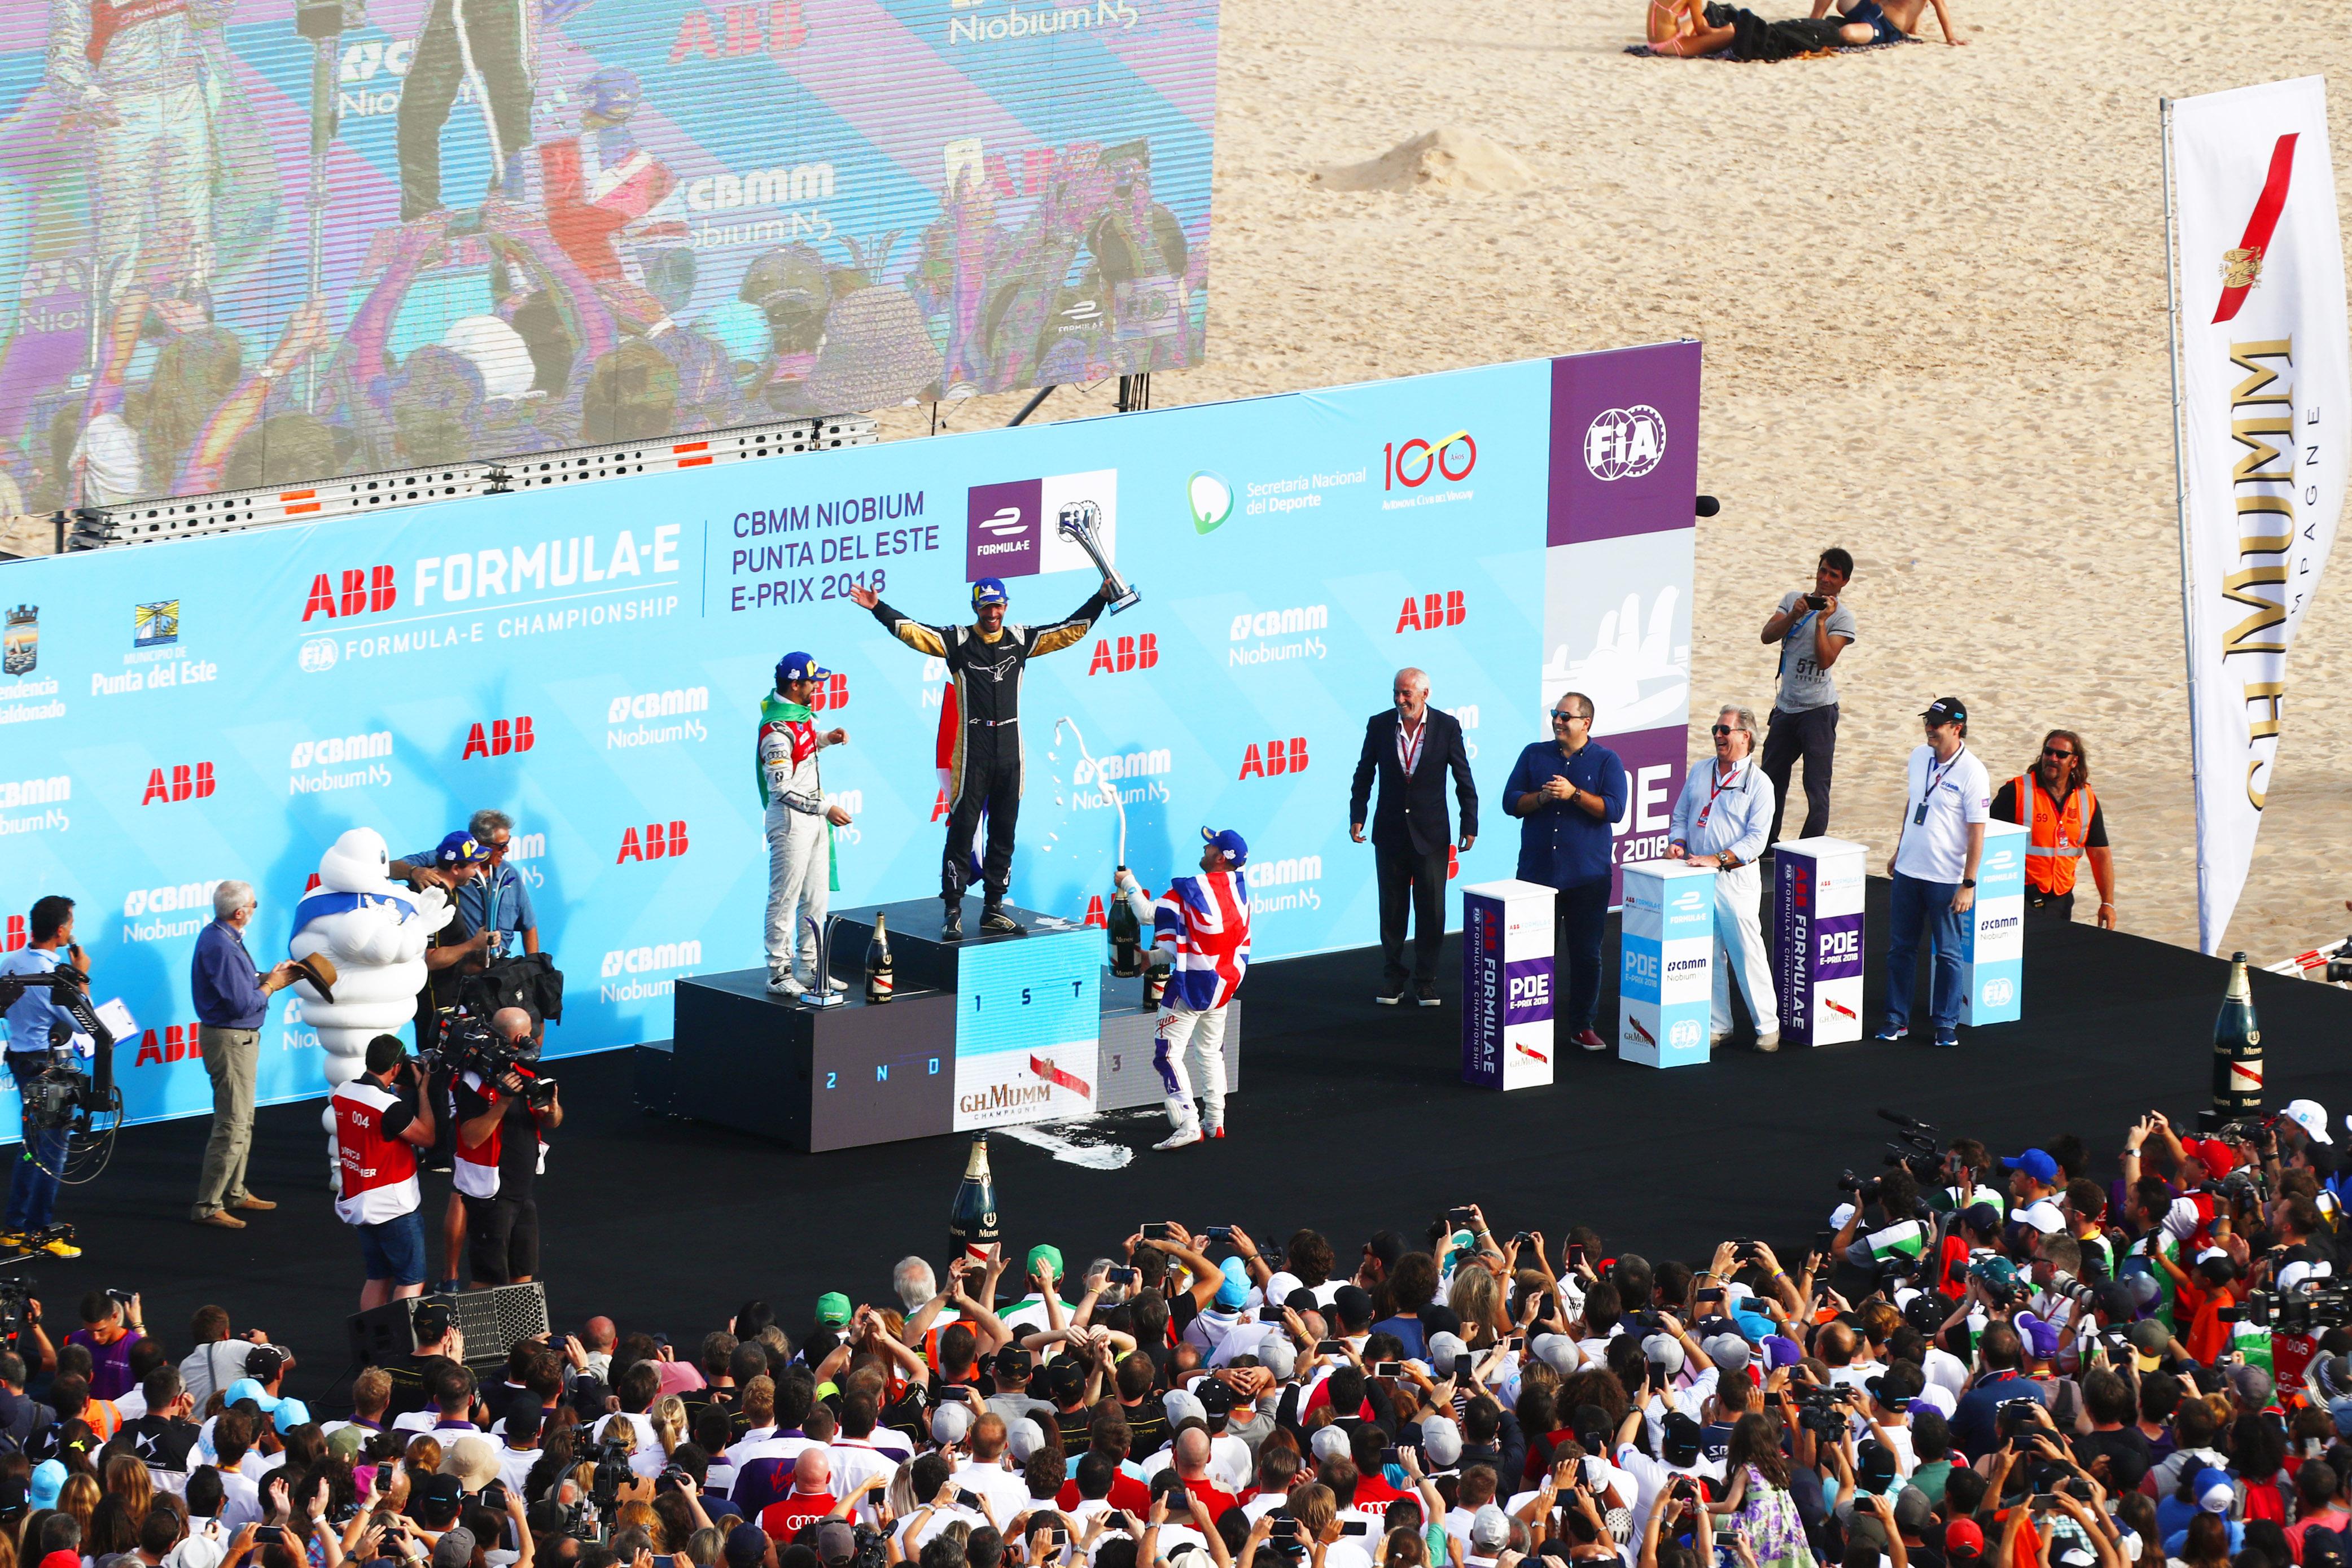 Jean-Eric Vergne (FRA), TECHEETAH, Renault Z.E. 17, Lucas Di Grassi (BRA), Audi Sport ABT Schaeffler, Audi e-tron FE04, and Sam Bird (GBR), DS Virgin Racing, DS Virgin DSV-03, spray the champagne on the podium.